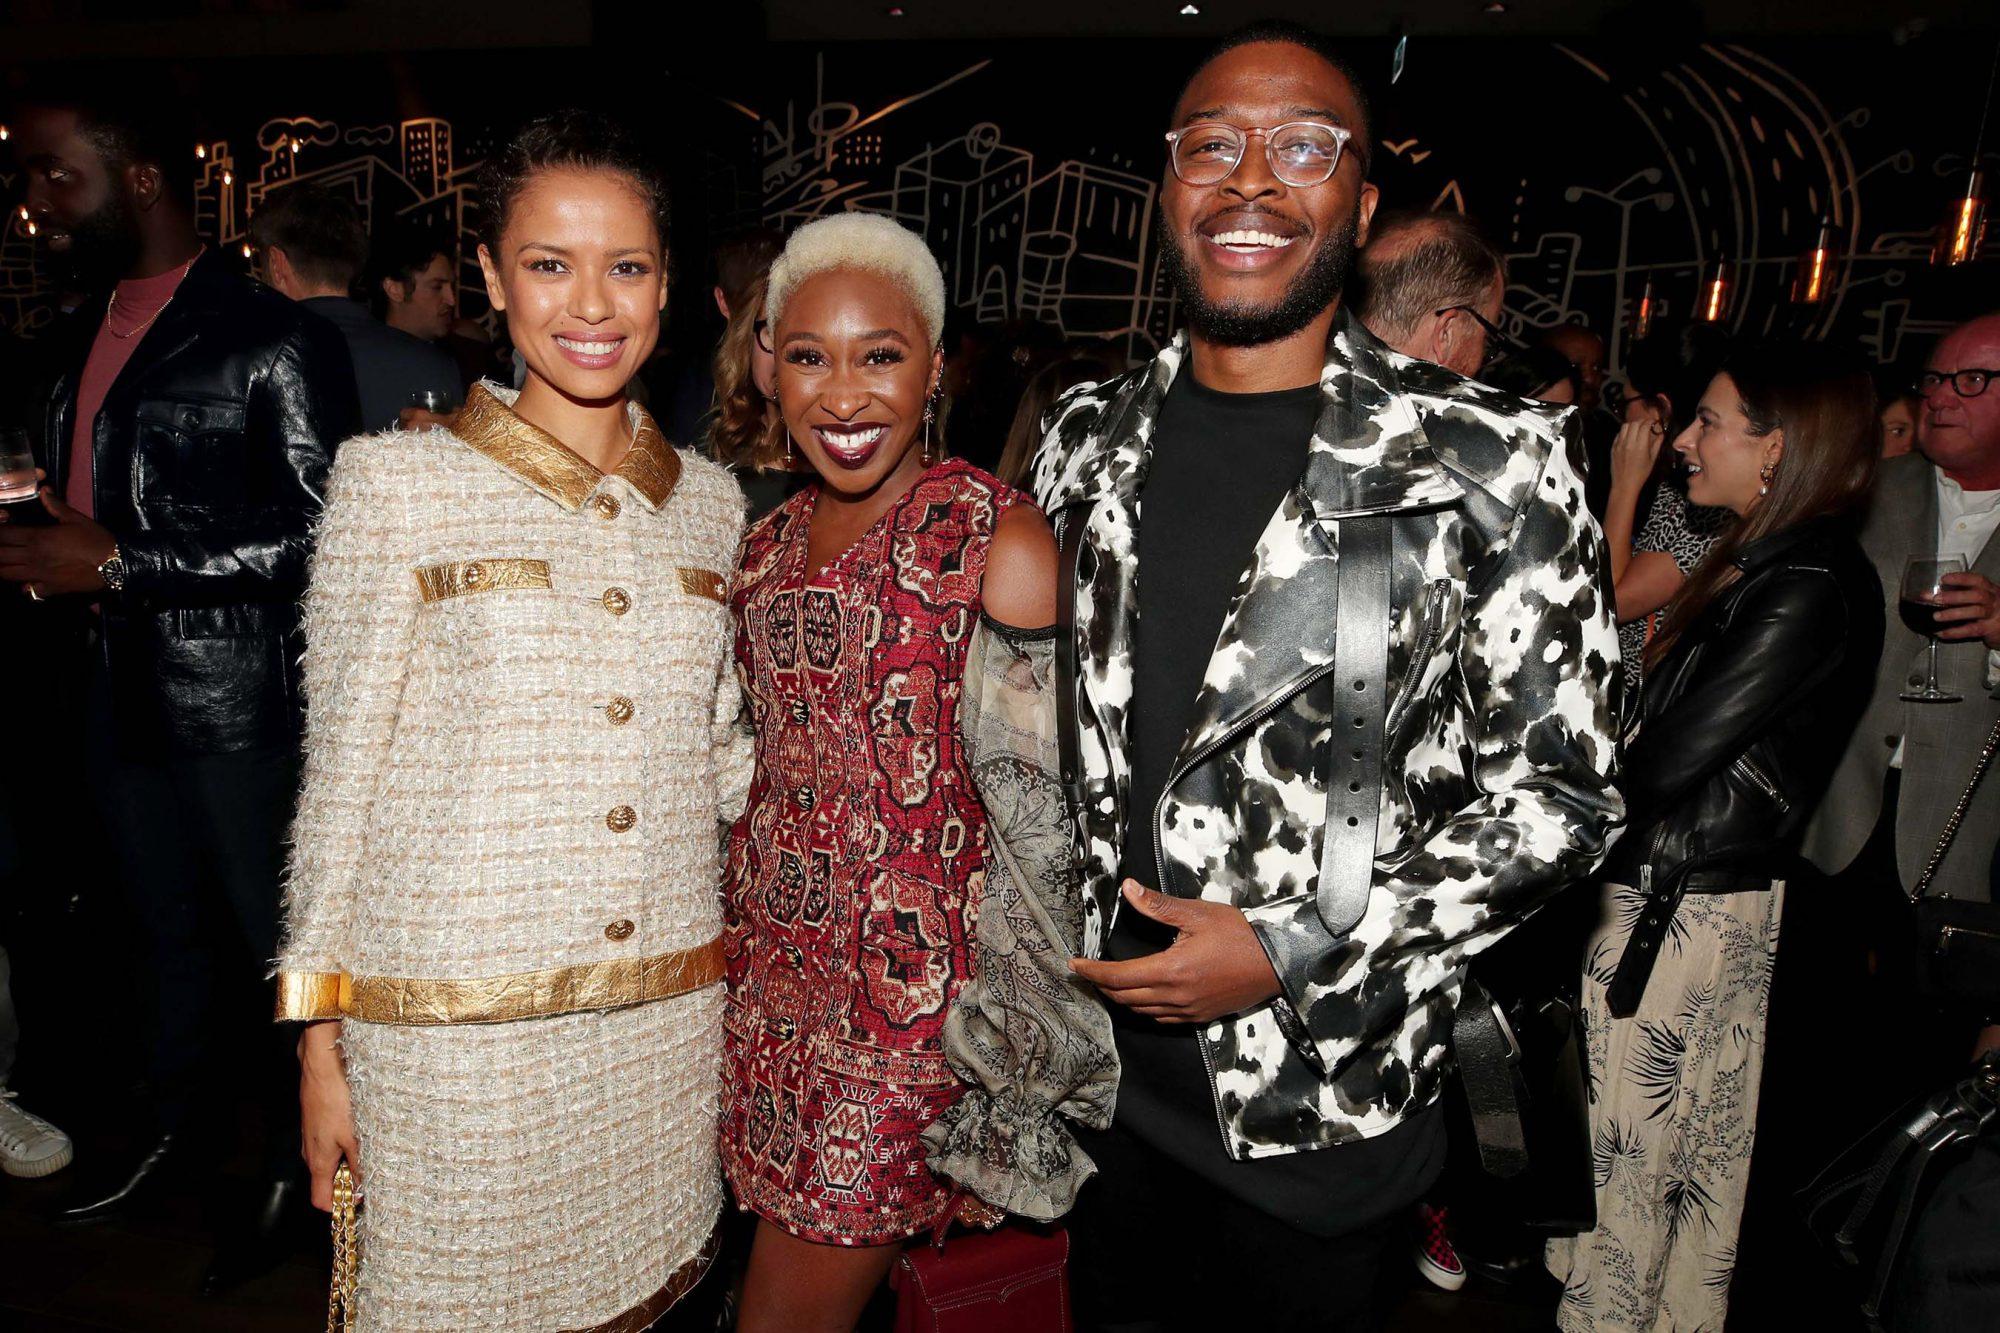 Gugu Mbatha-Raw, Cynthia Erivo and Zackary